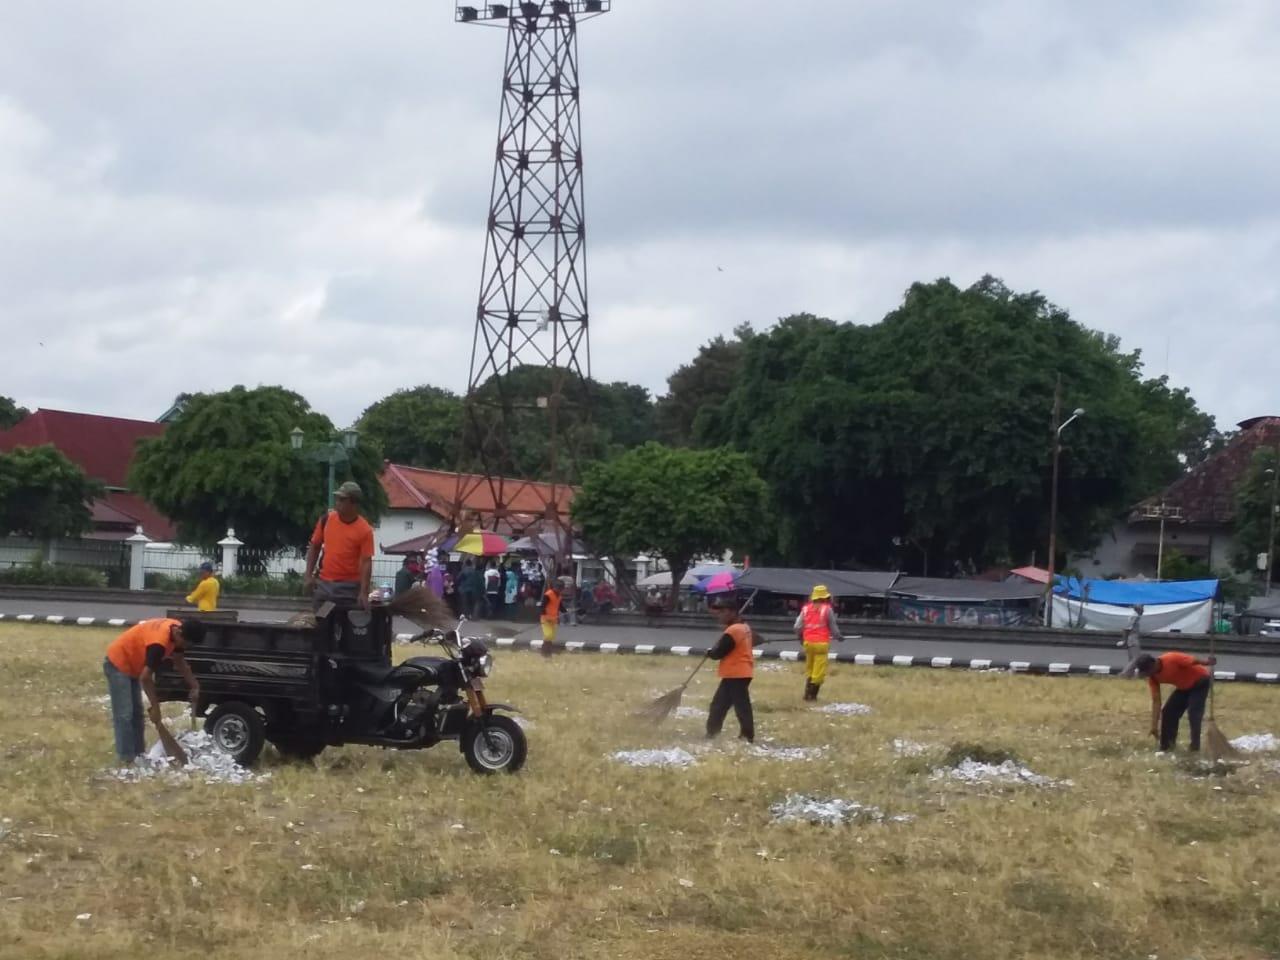 DLH Bersihkan Sampah Akibat Petasan di Alun-alun Utara